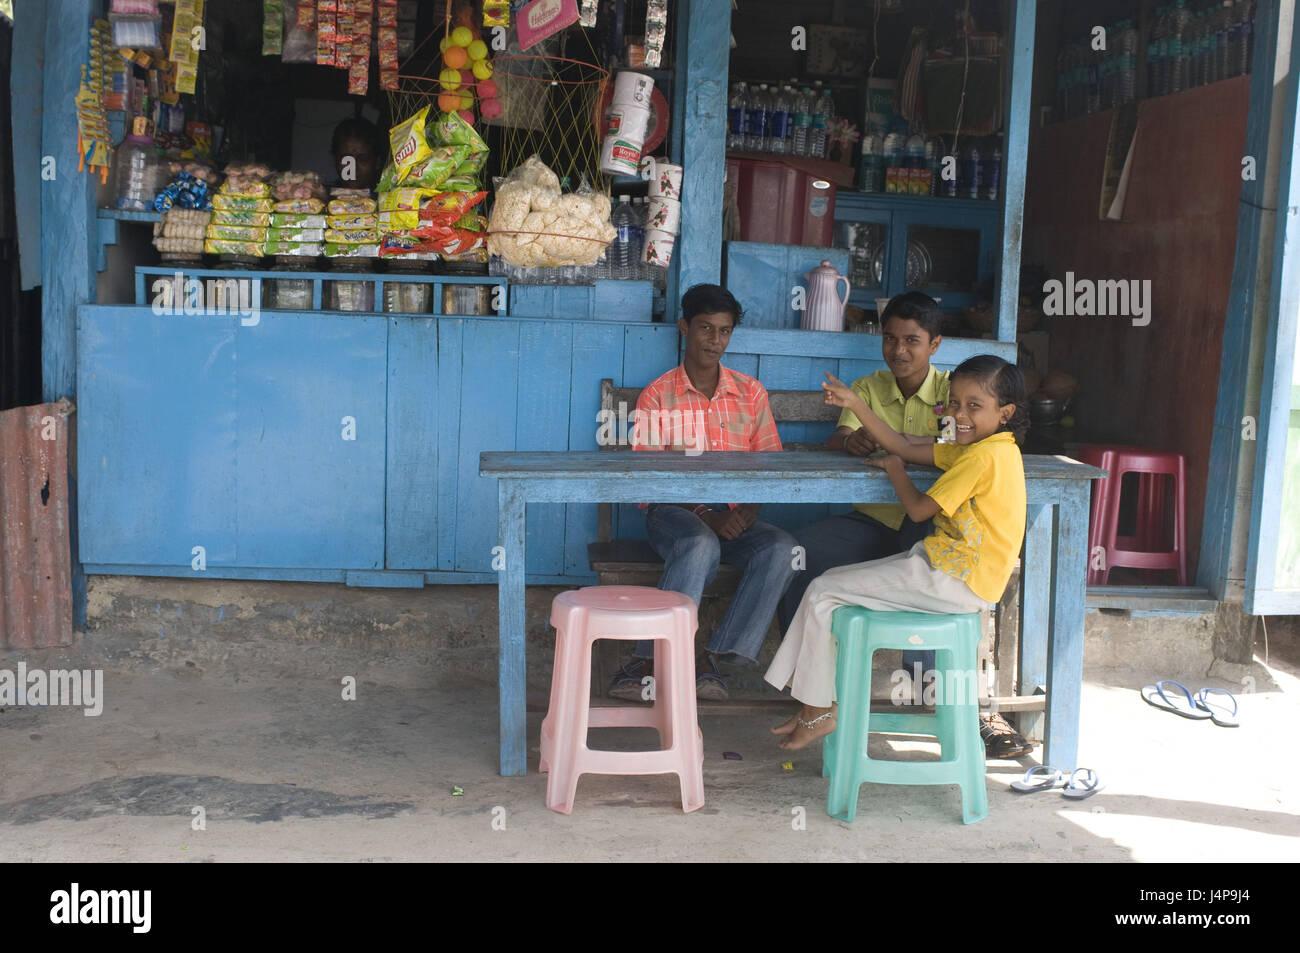 Market stall, man, children, table, sit, Havelock Insel, Andamanen, India, - Stock Image